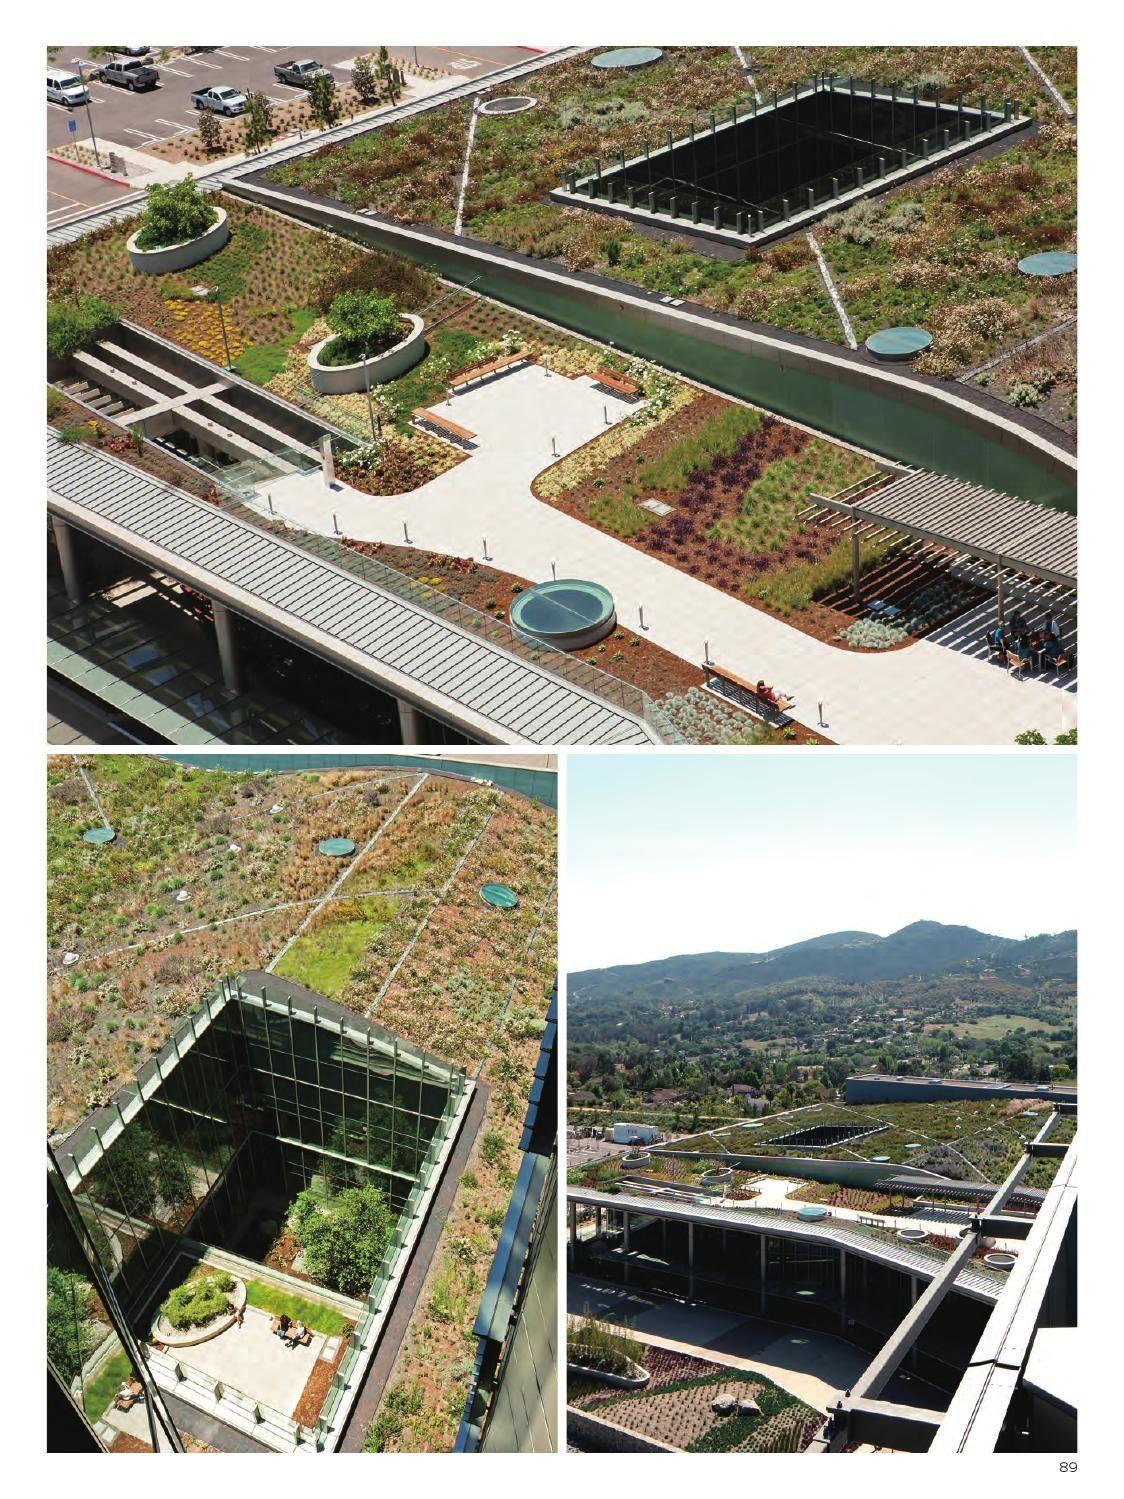 Roof Garden Landscape - World Landscape Case Studies #landsacpe #design # Garden Idea #architecture | Roof Garden, Garden Landscaping, Landscape